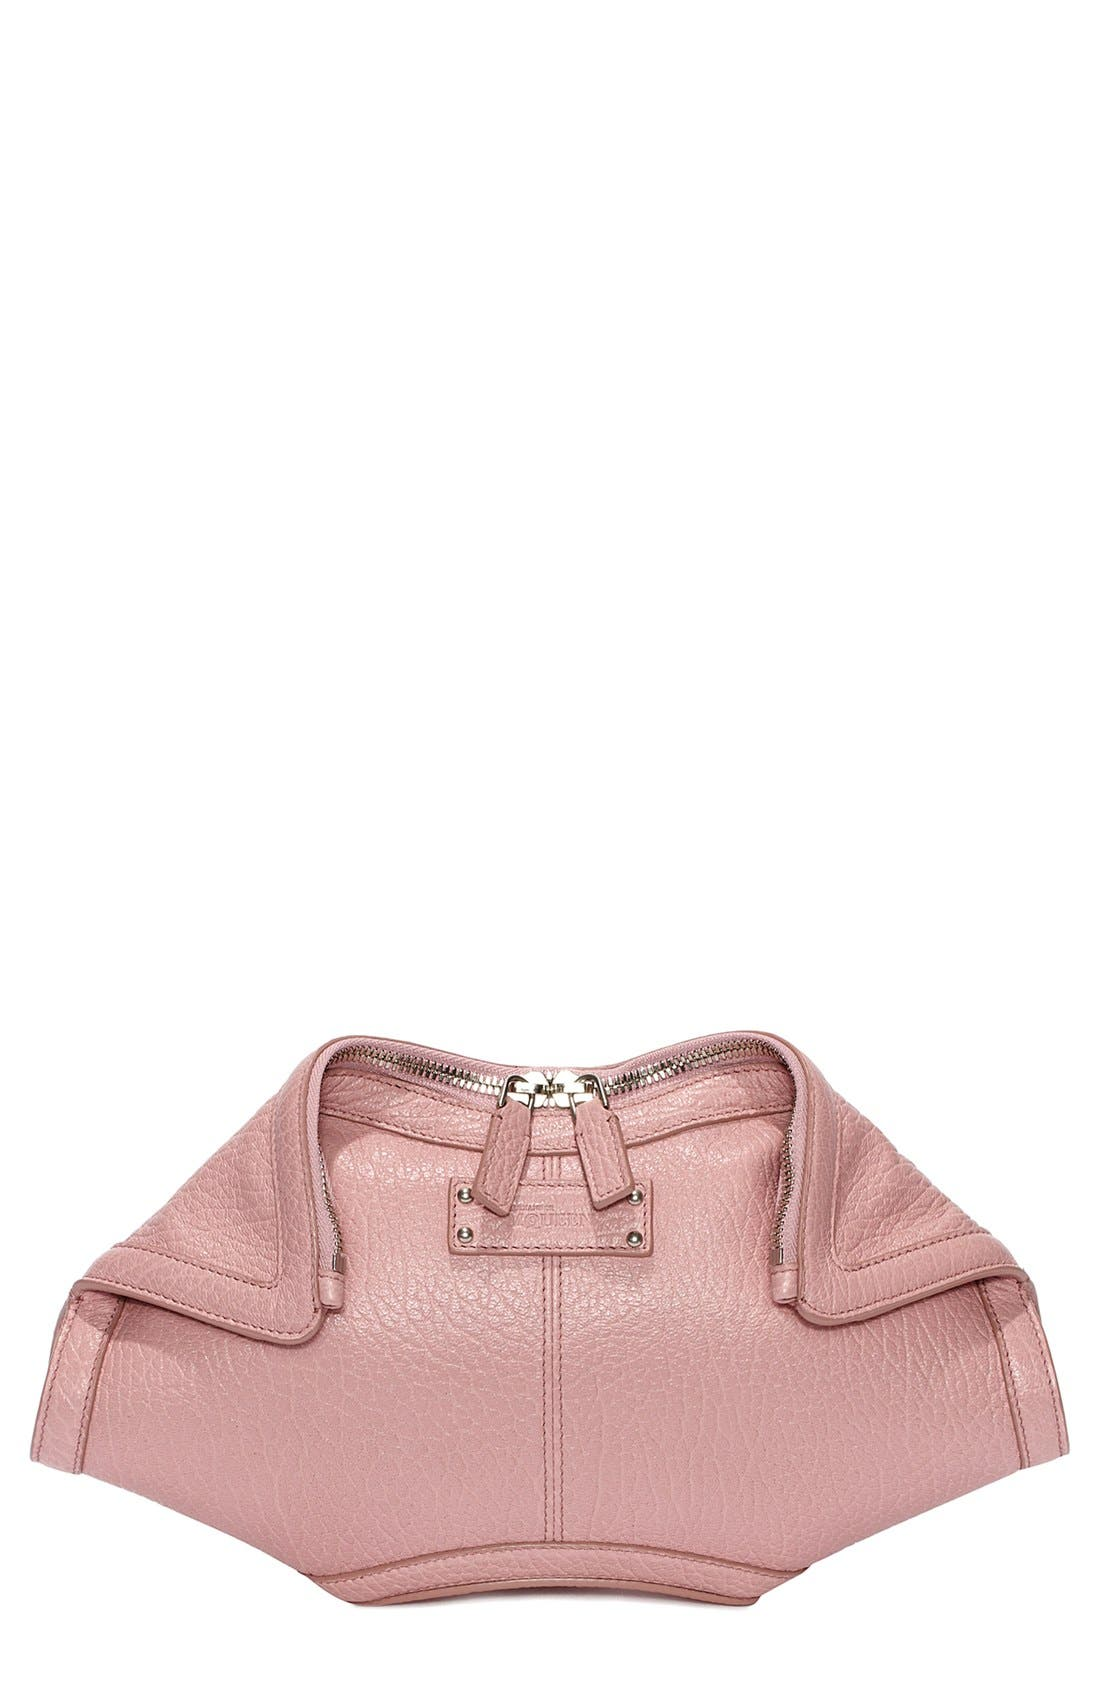 'Small De Manta' Leather Clutch,                         Main,                         color, Lilac